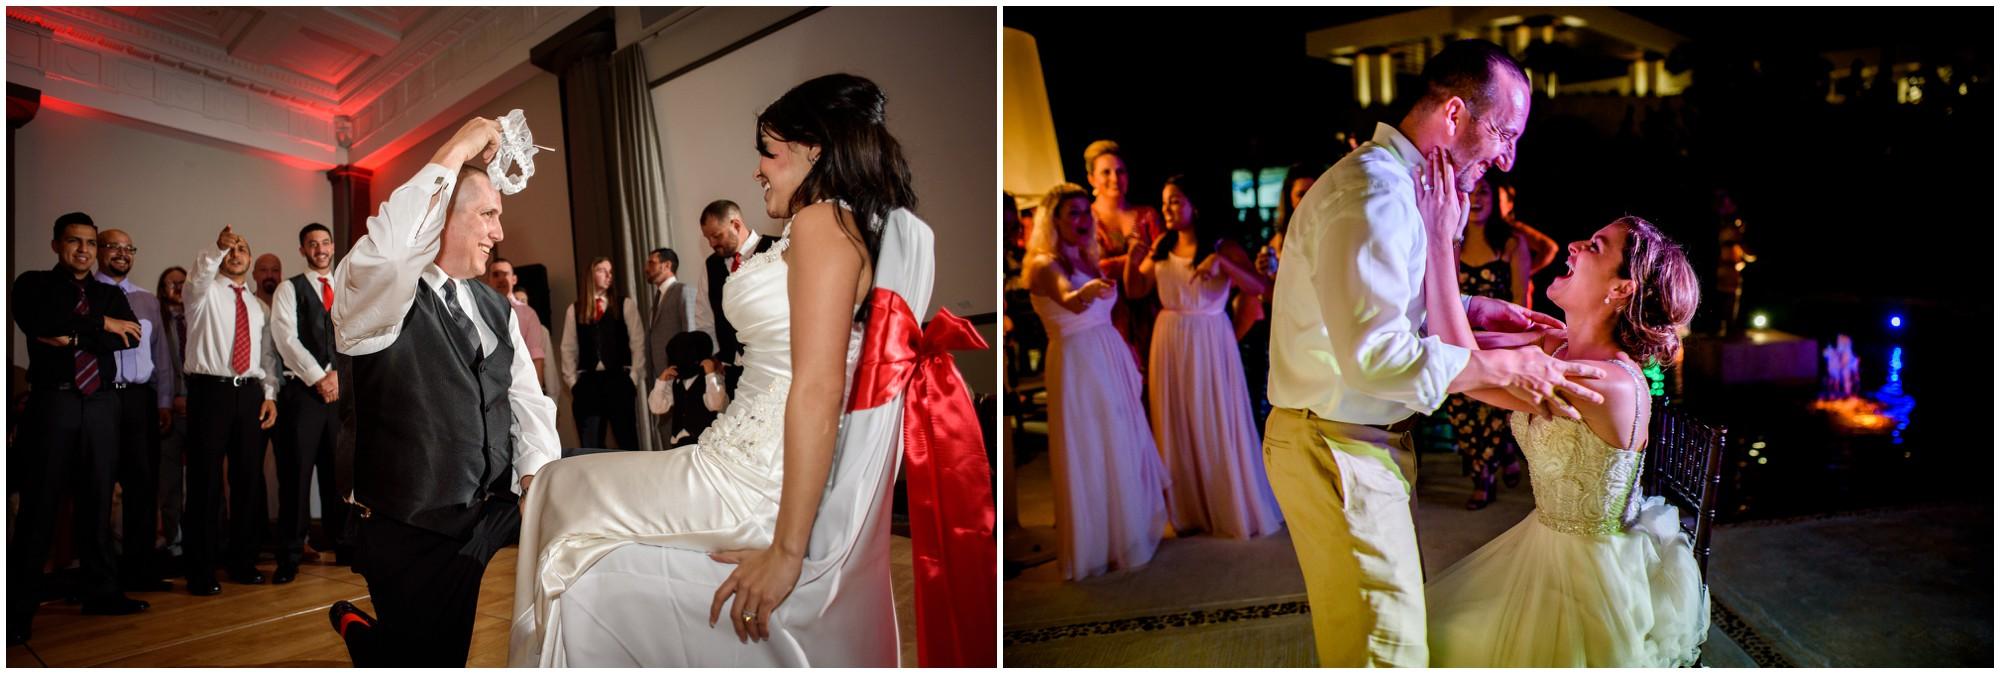 1102-Downtown-Denver-Magnolia-Hotel-Wedding-photography.jpg